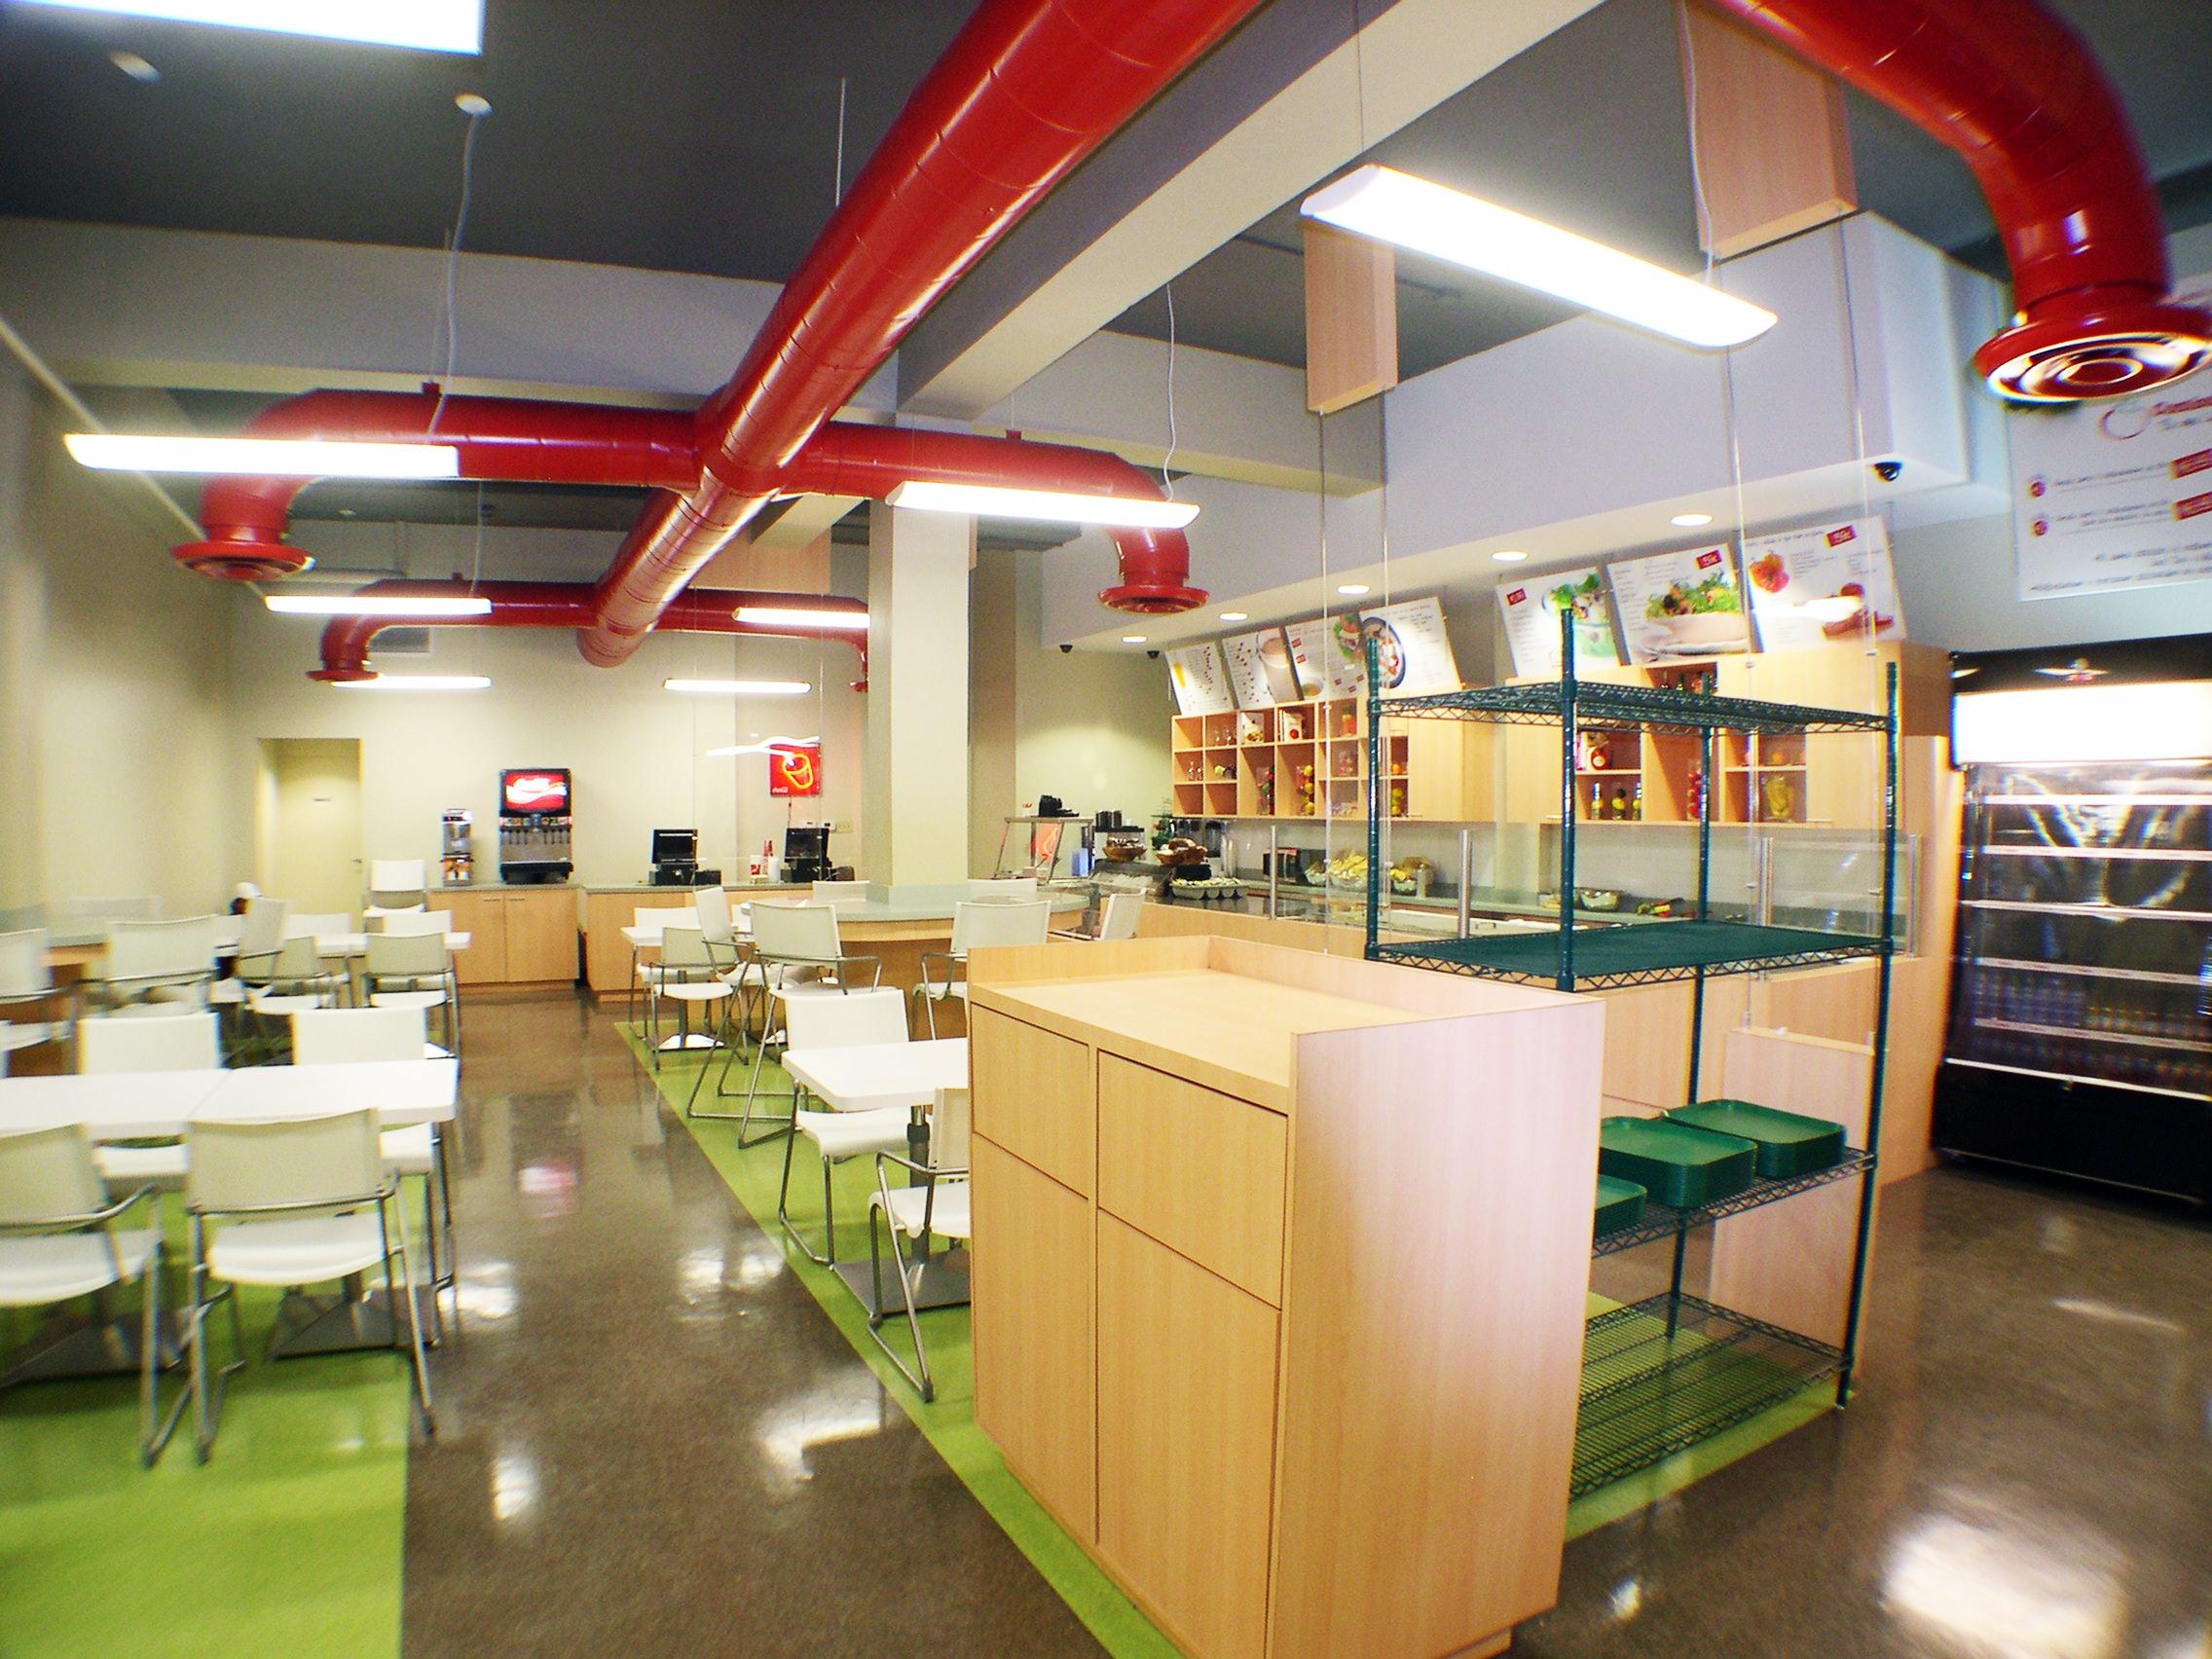 Restaurant finished interior